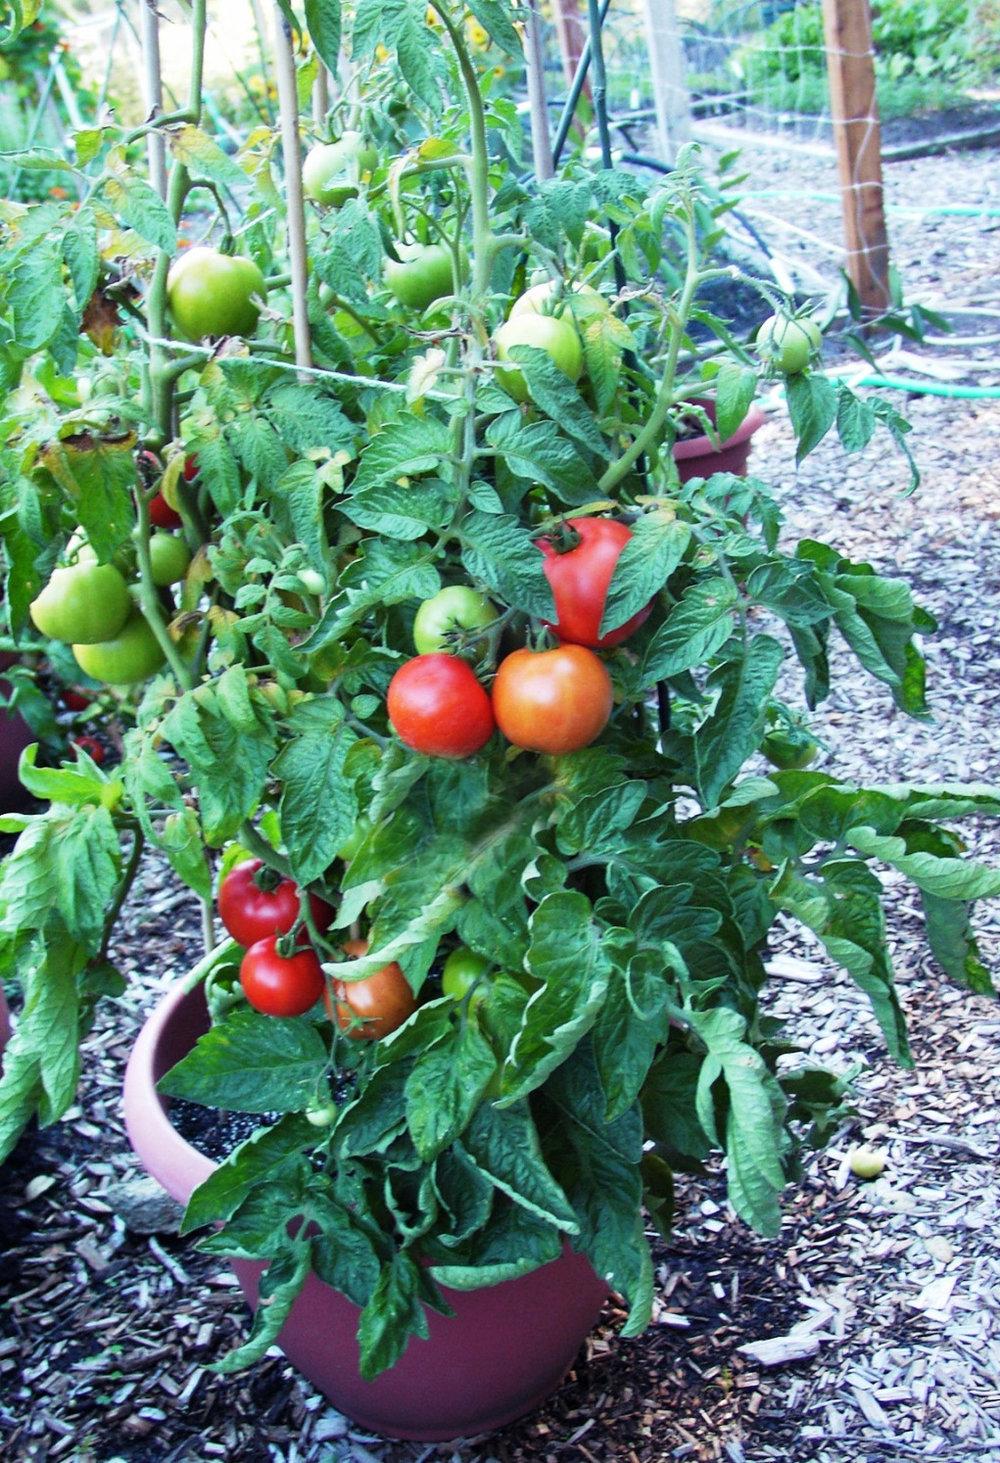 'Super Bush' hybrid tomato was bred to be compact.